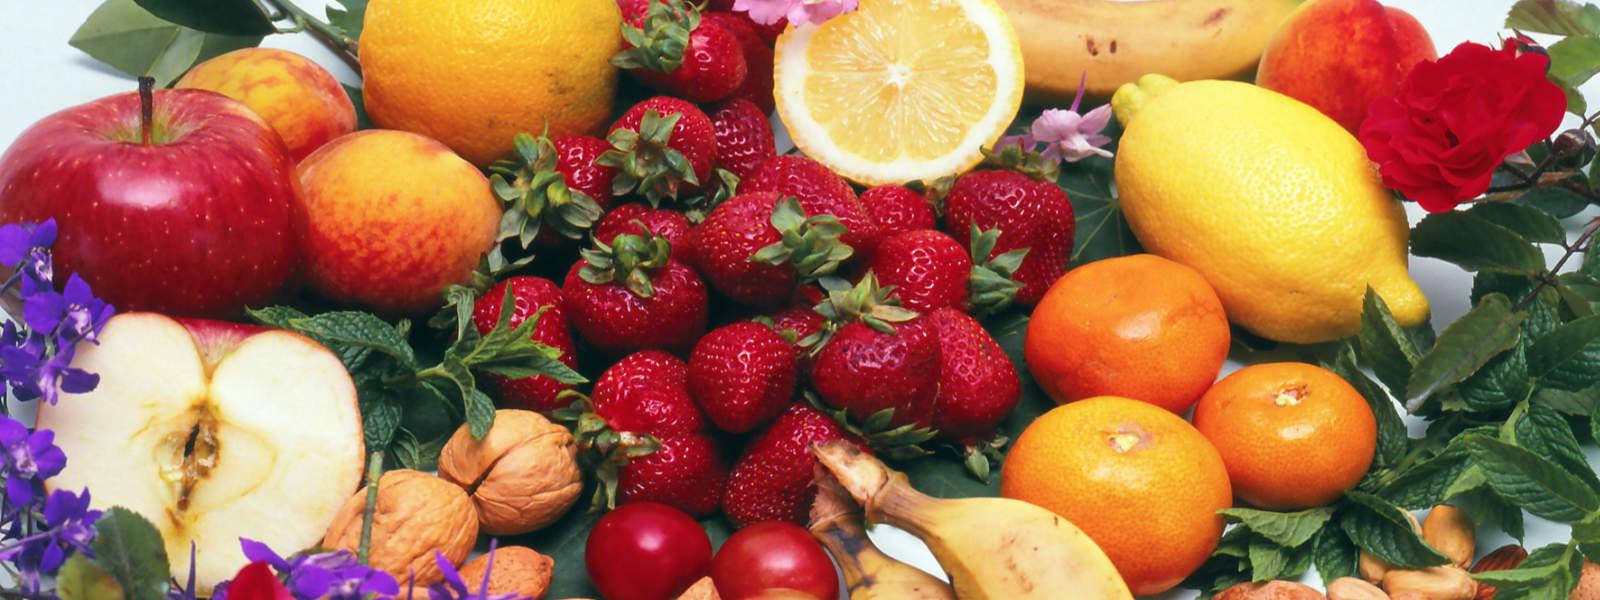 frutas-banner